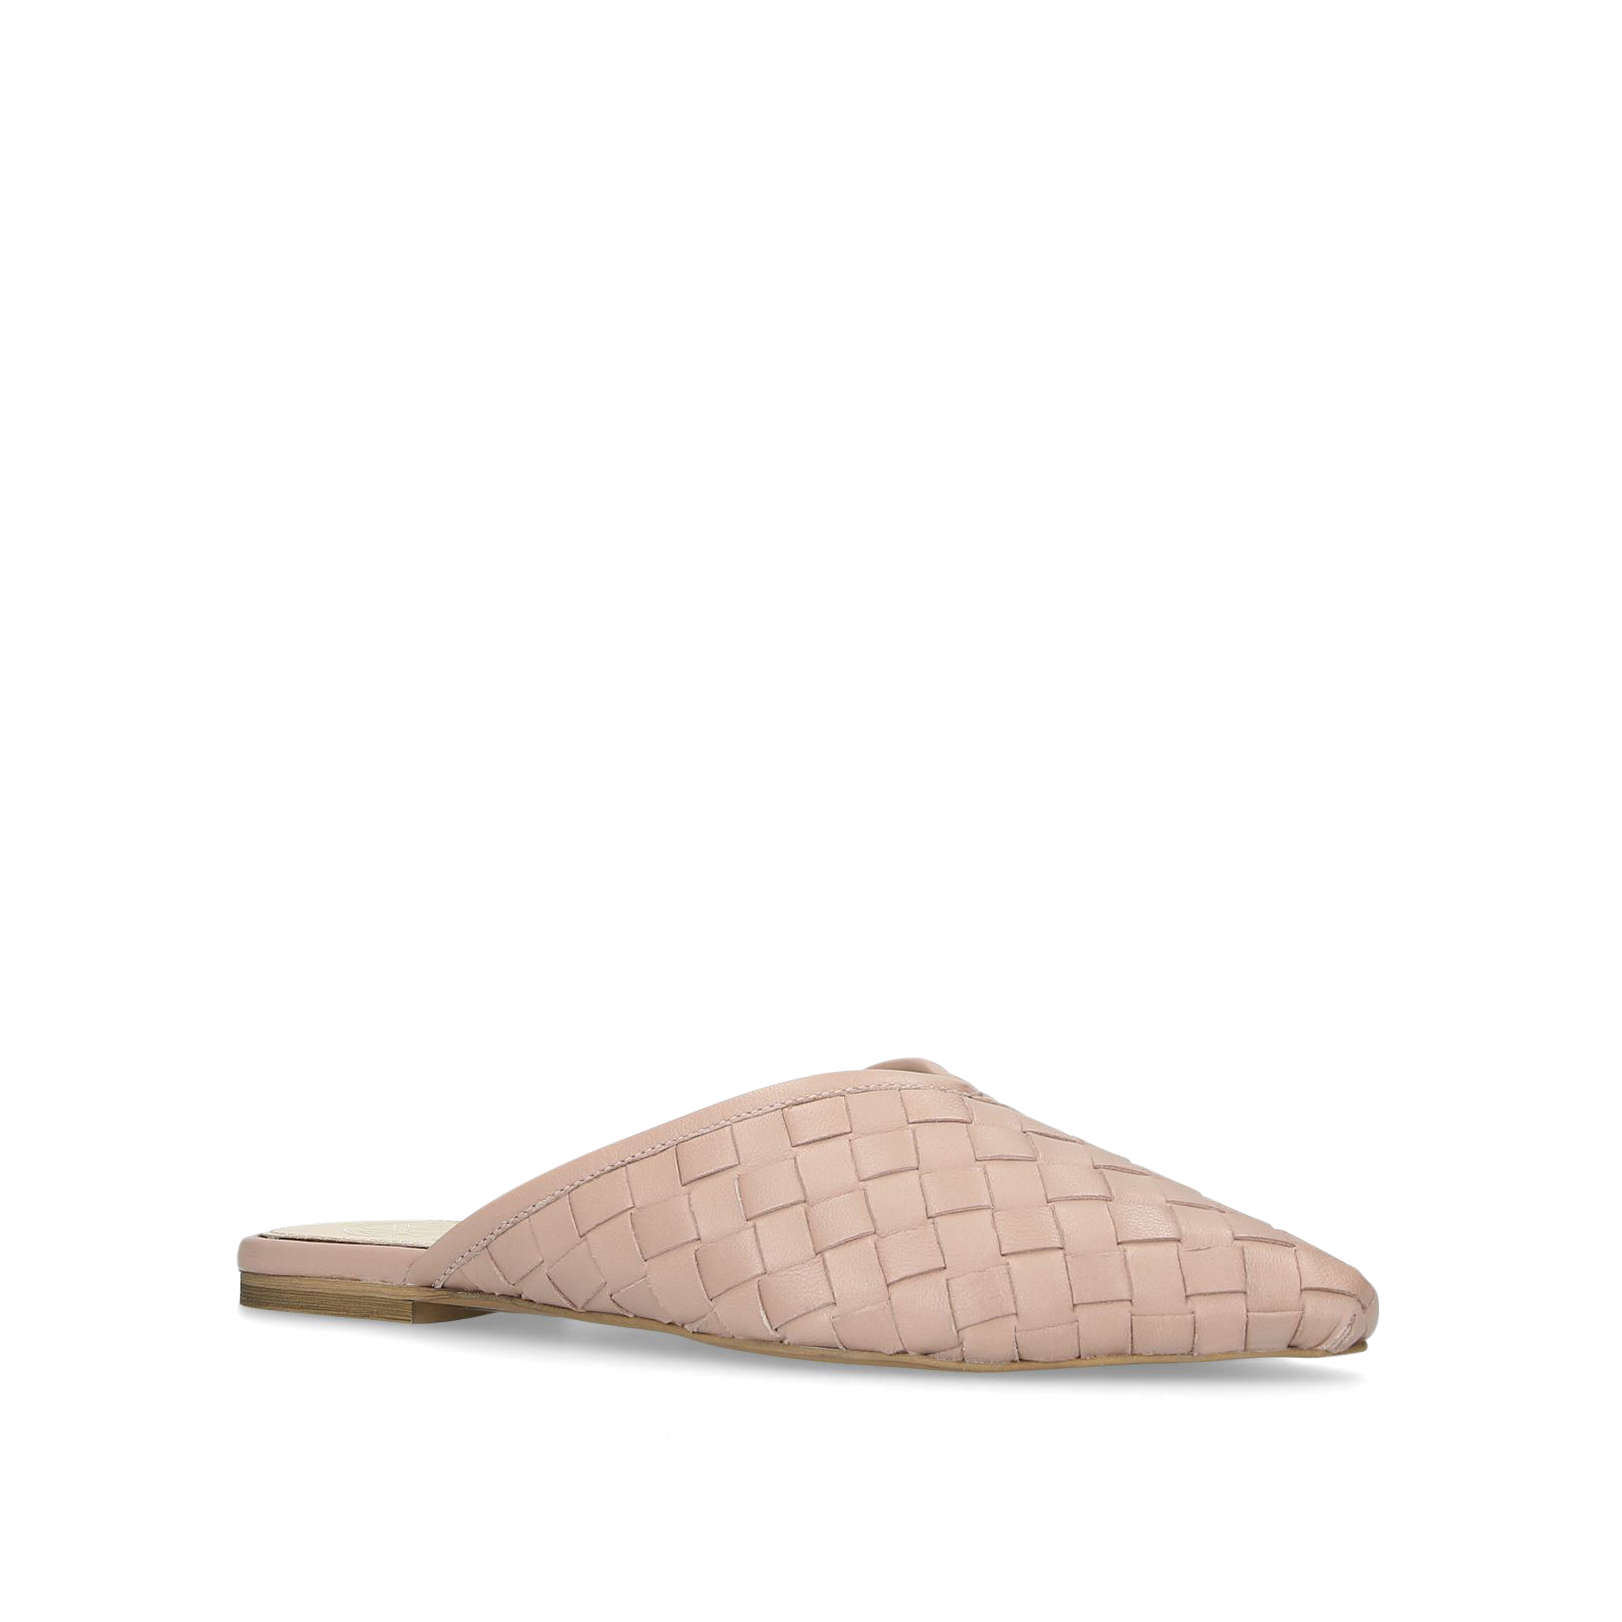 Carvela Kurt Geiger Synthetic Scalt High Heel Wedge